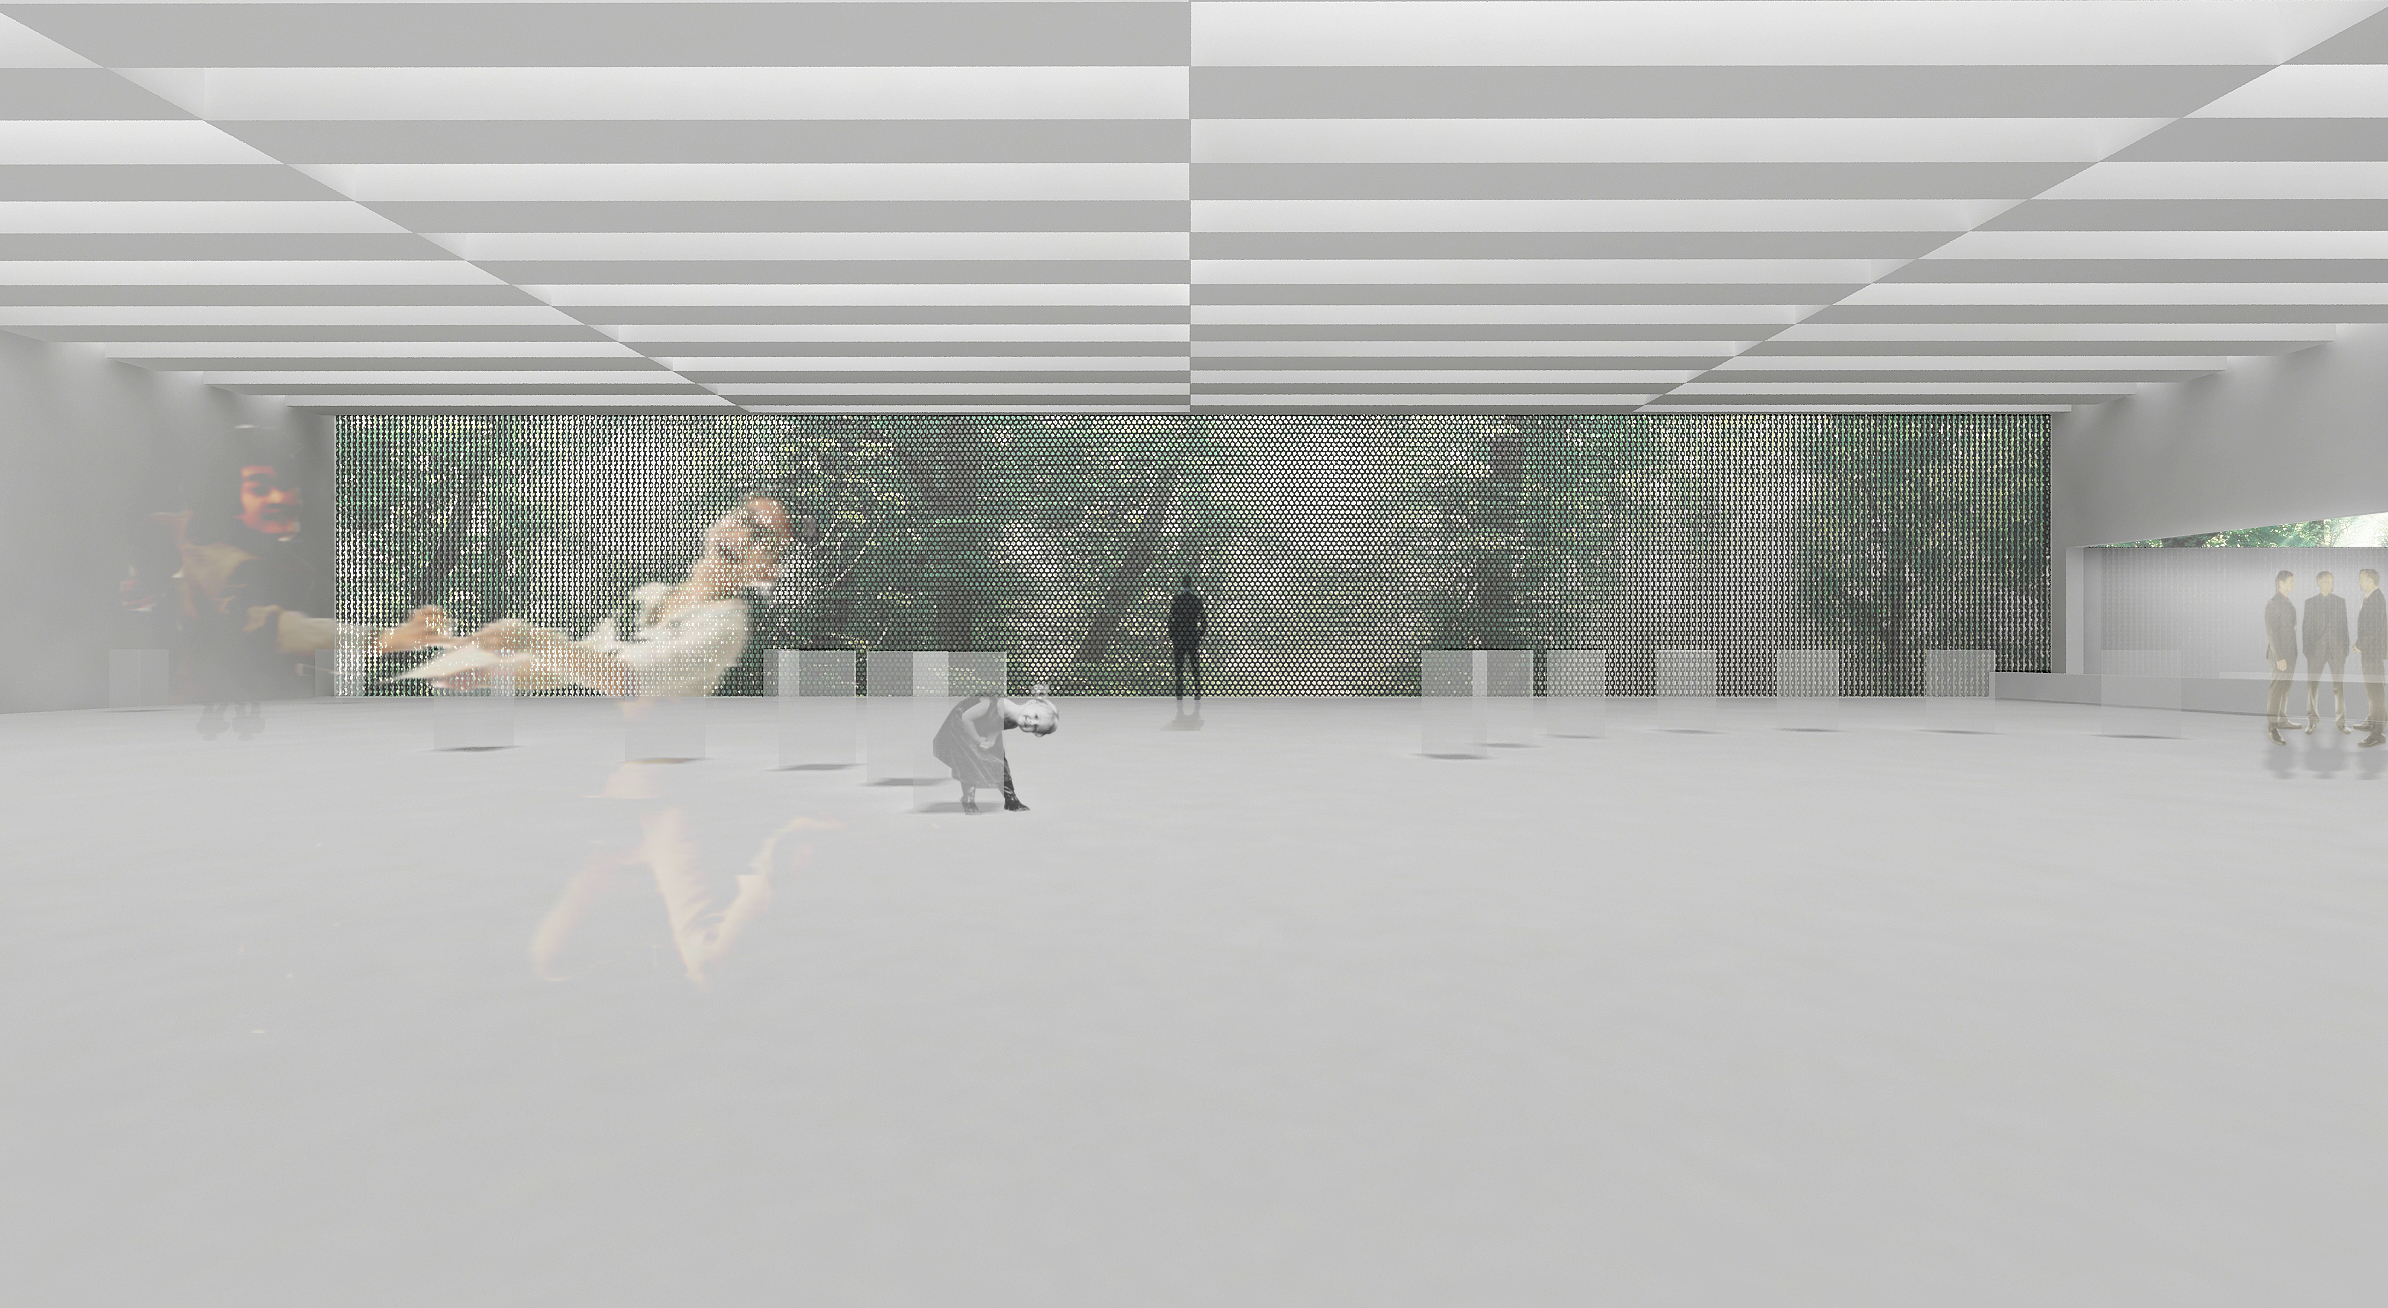 planell-hirsch_concurso_arquitectura_calvia 05